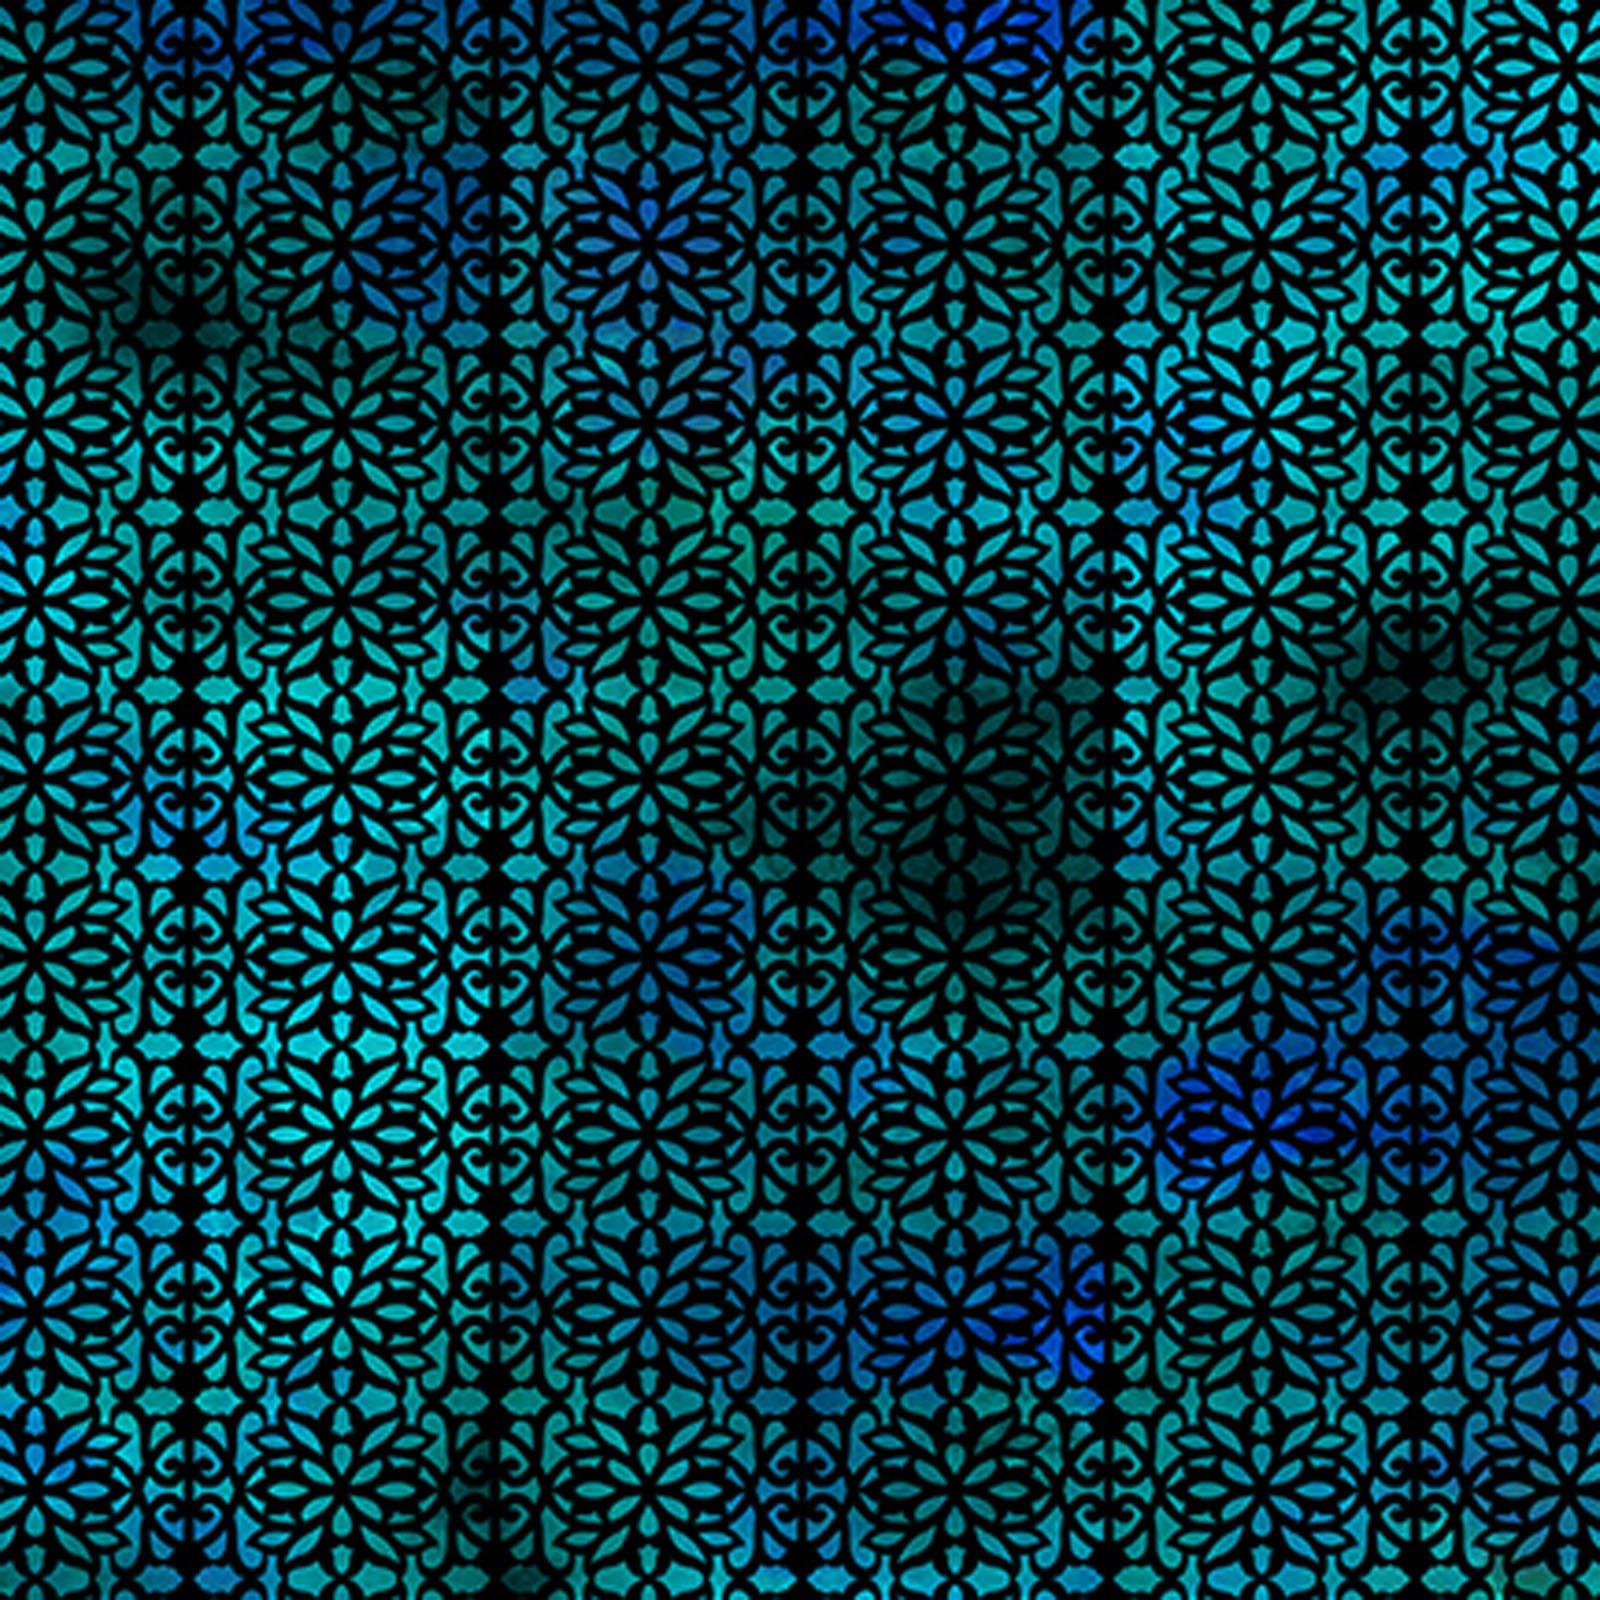 INTH-11FGE 1 - FLORAGRAPHIX V BY JASON YENTER FILIGREE GRN/BLUE